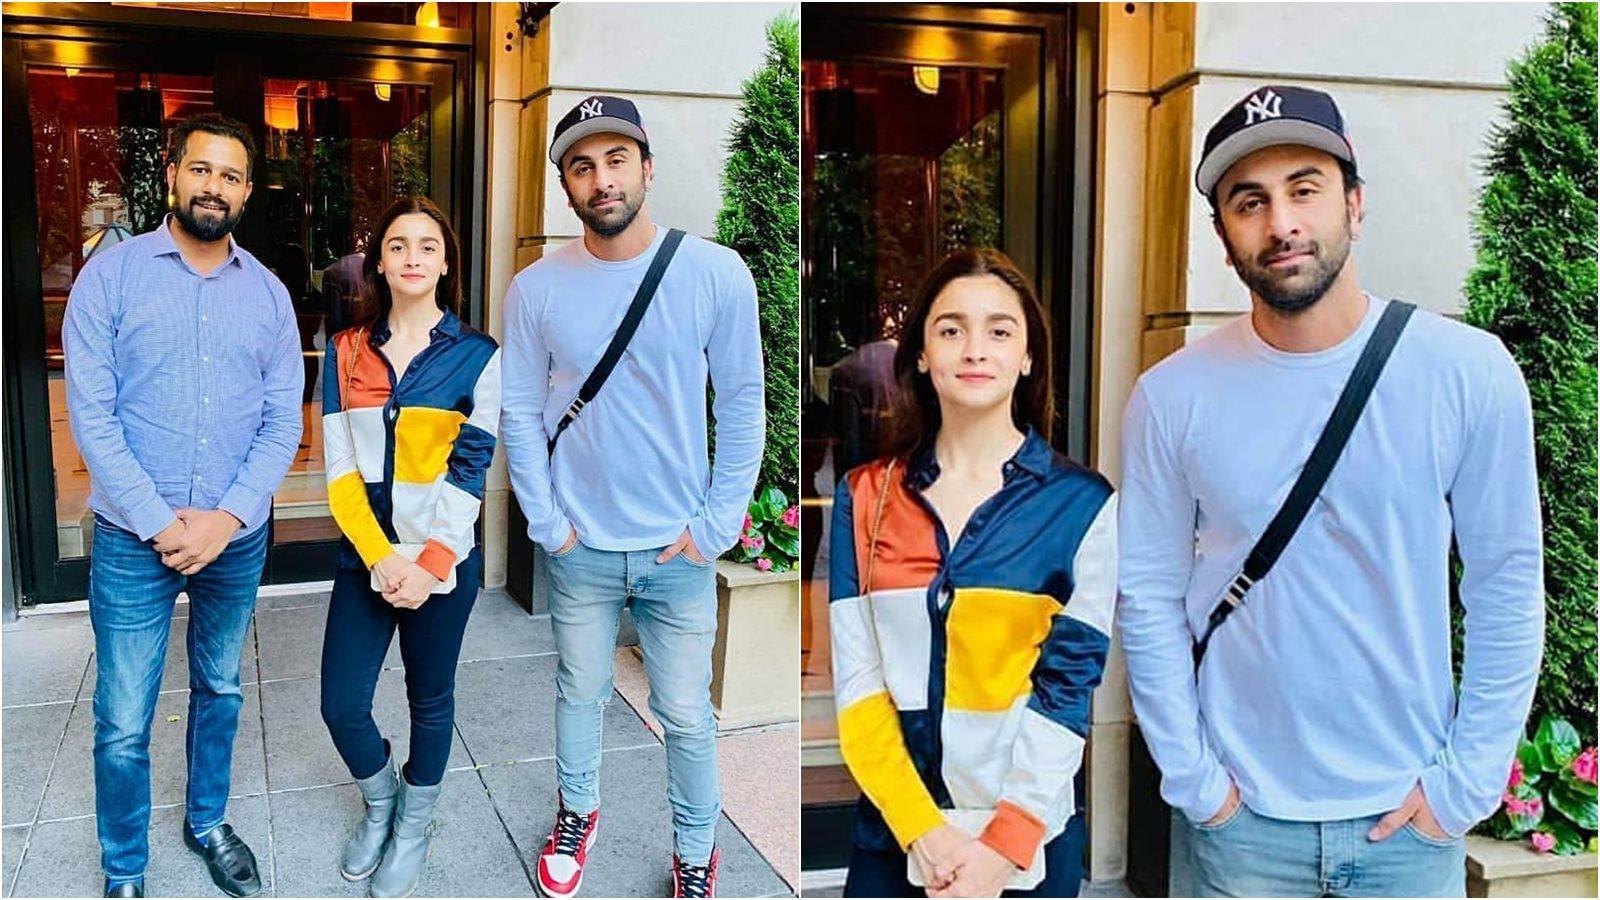 Ranbir Kapoor and Alia Bhatt strike a pose with fan in Los Angeles